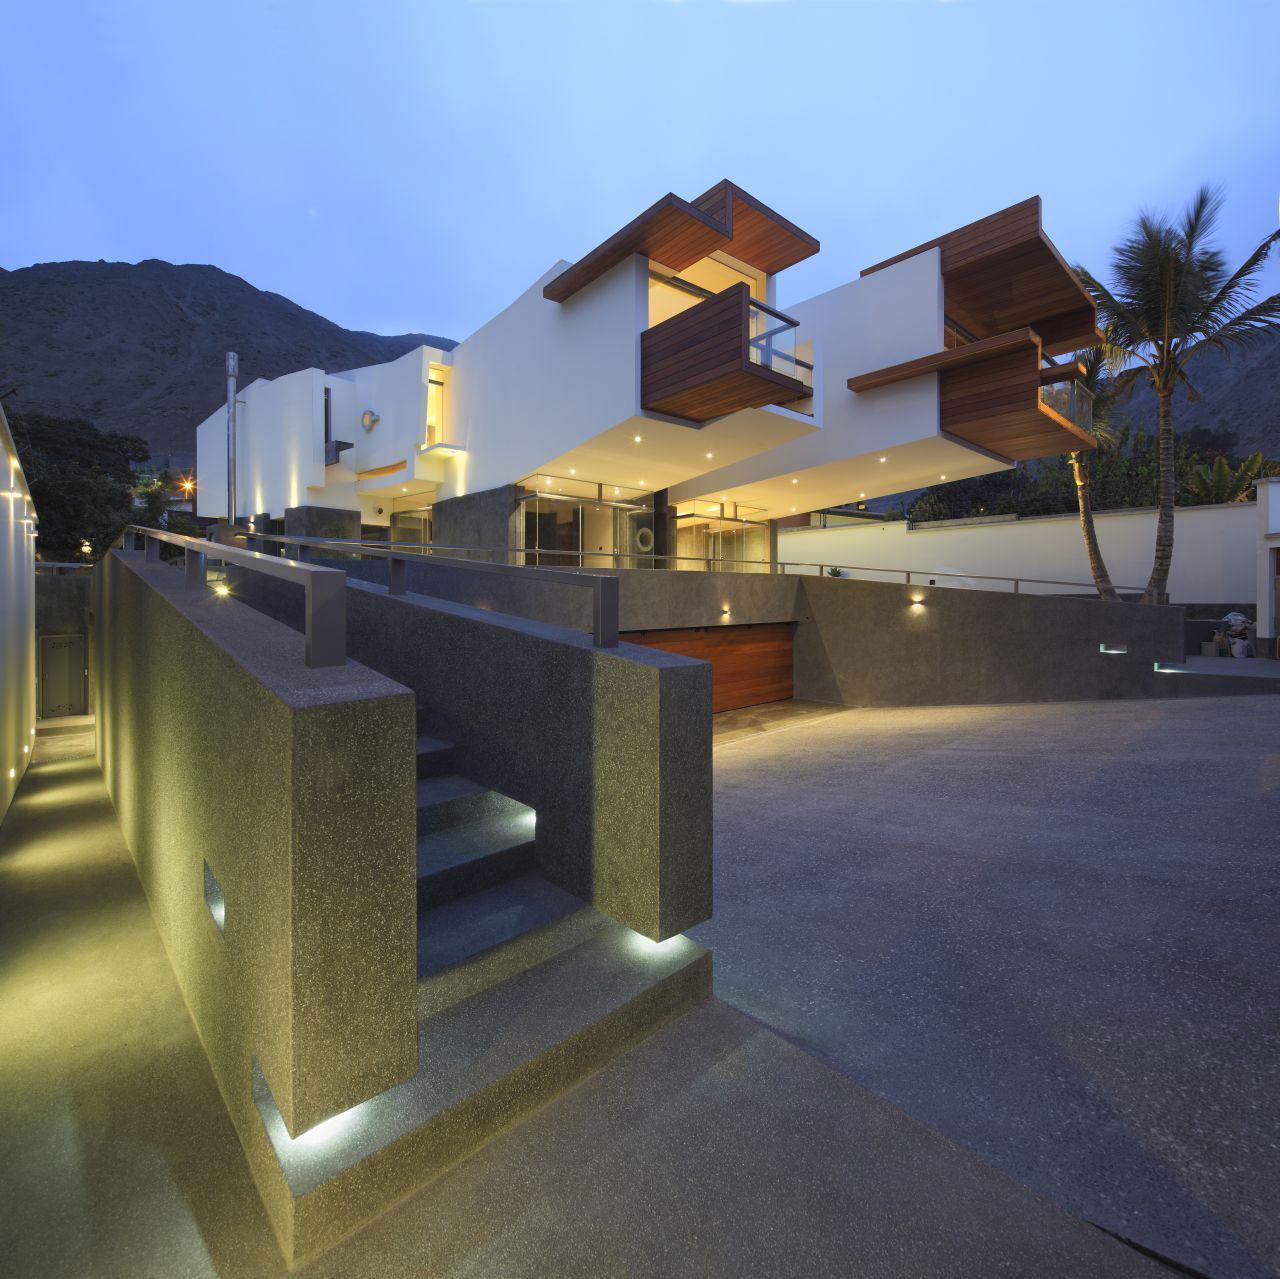 Evening, Outdoor Lighting, Home in La Planicie, Lima